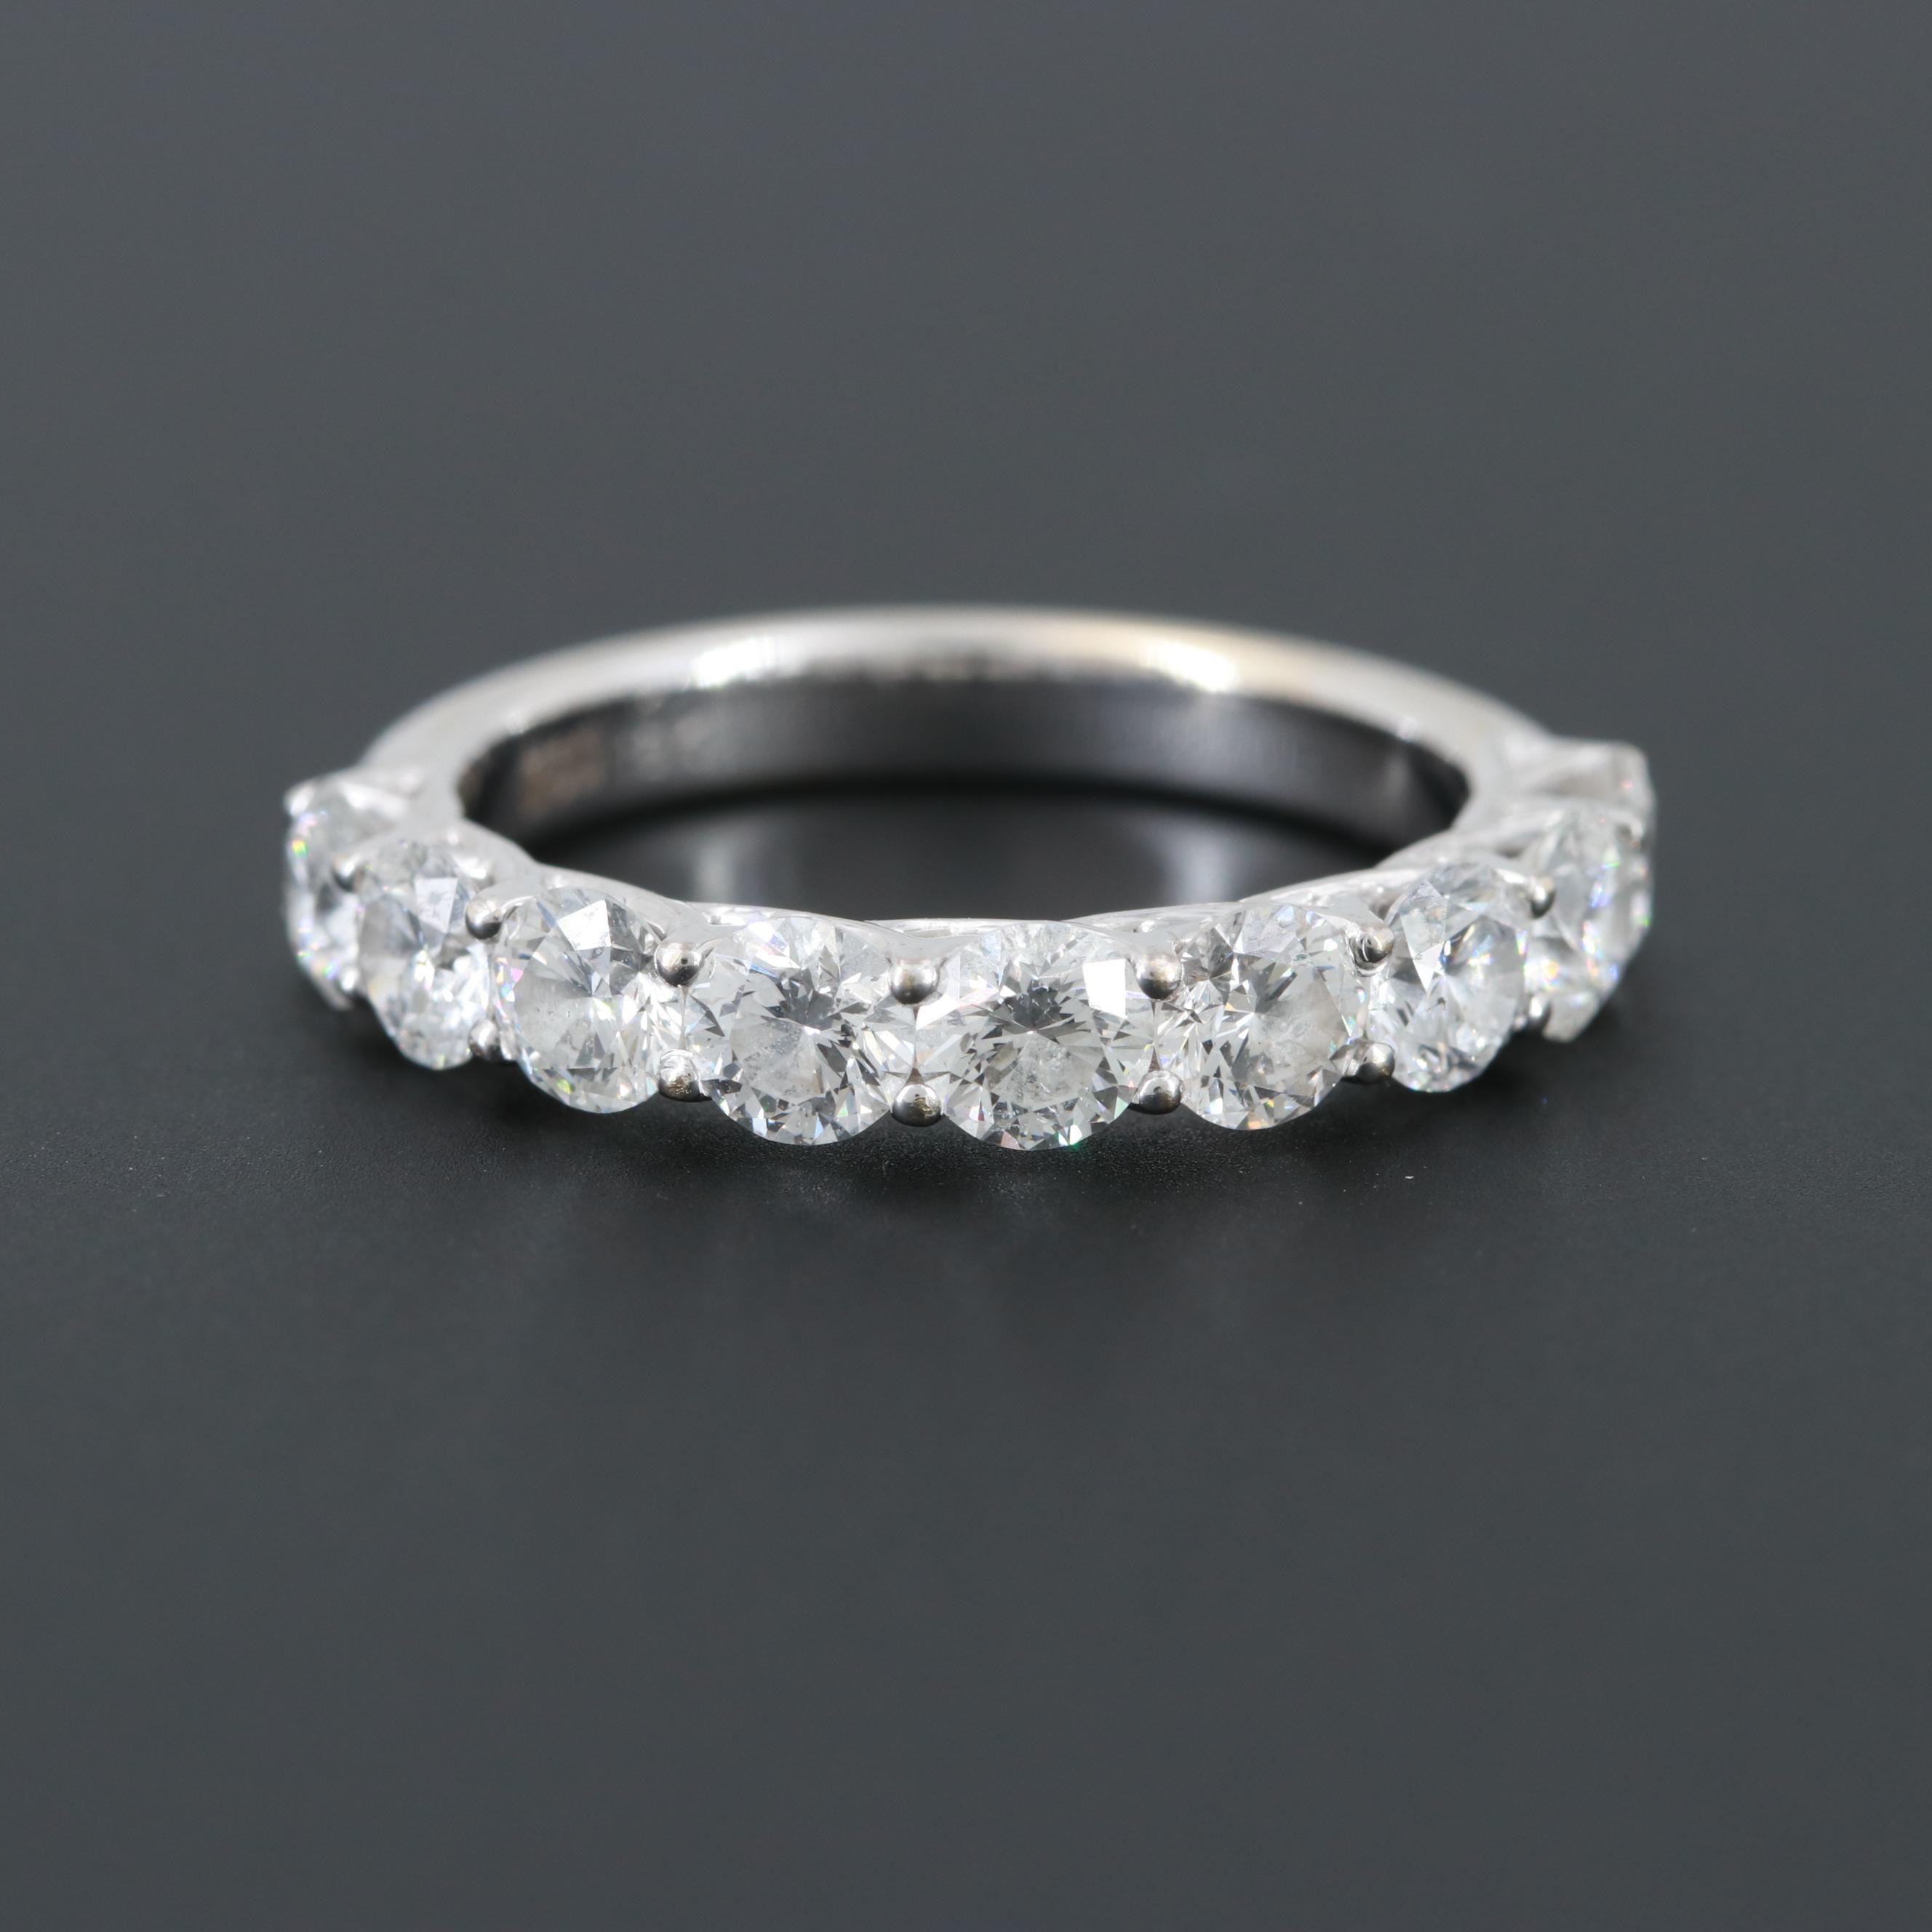 18K White Gold 1.57 CTW Diamond Ring